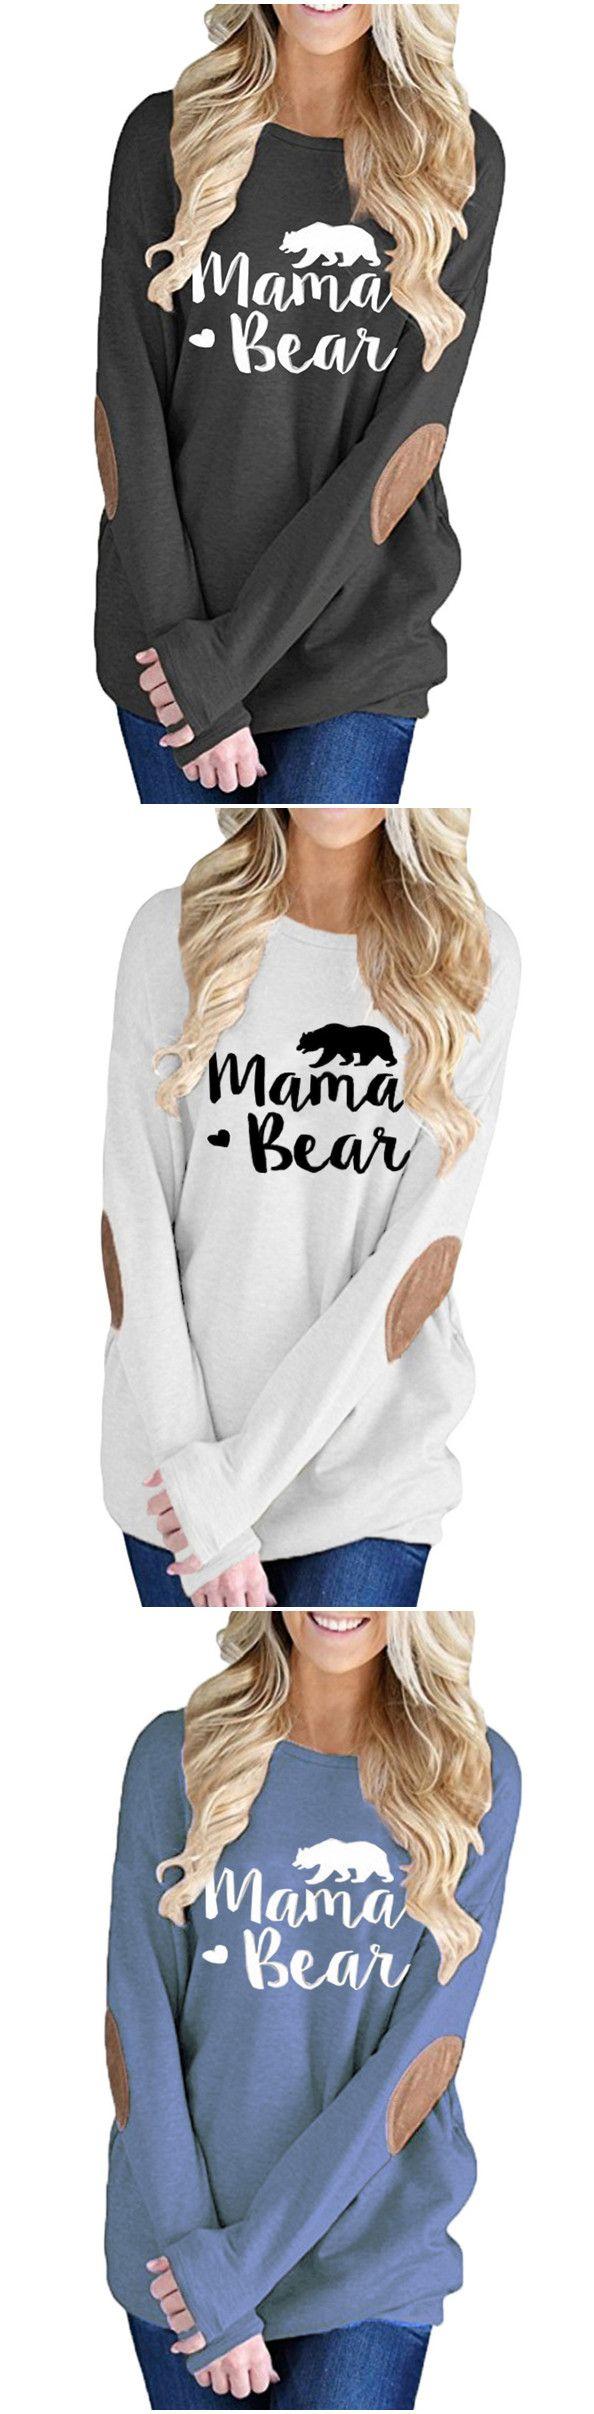 Love this mama bear sweatshirt. Looks so comfy.